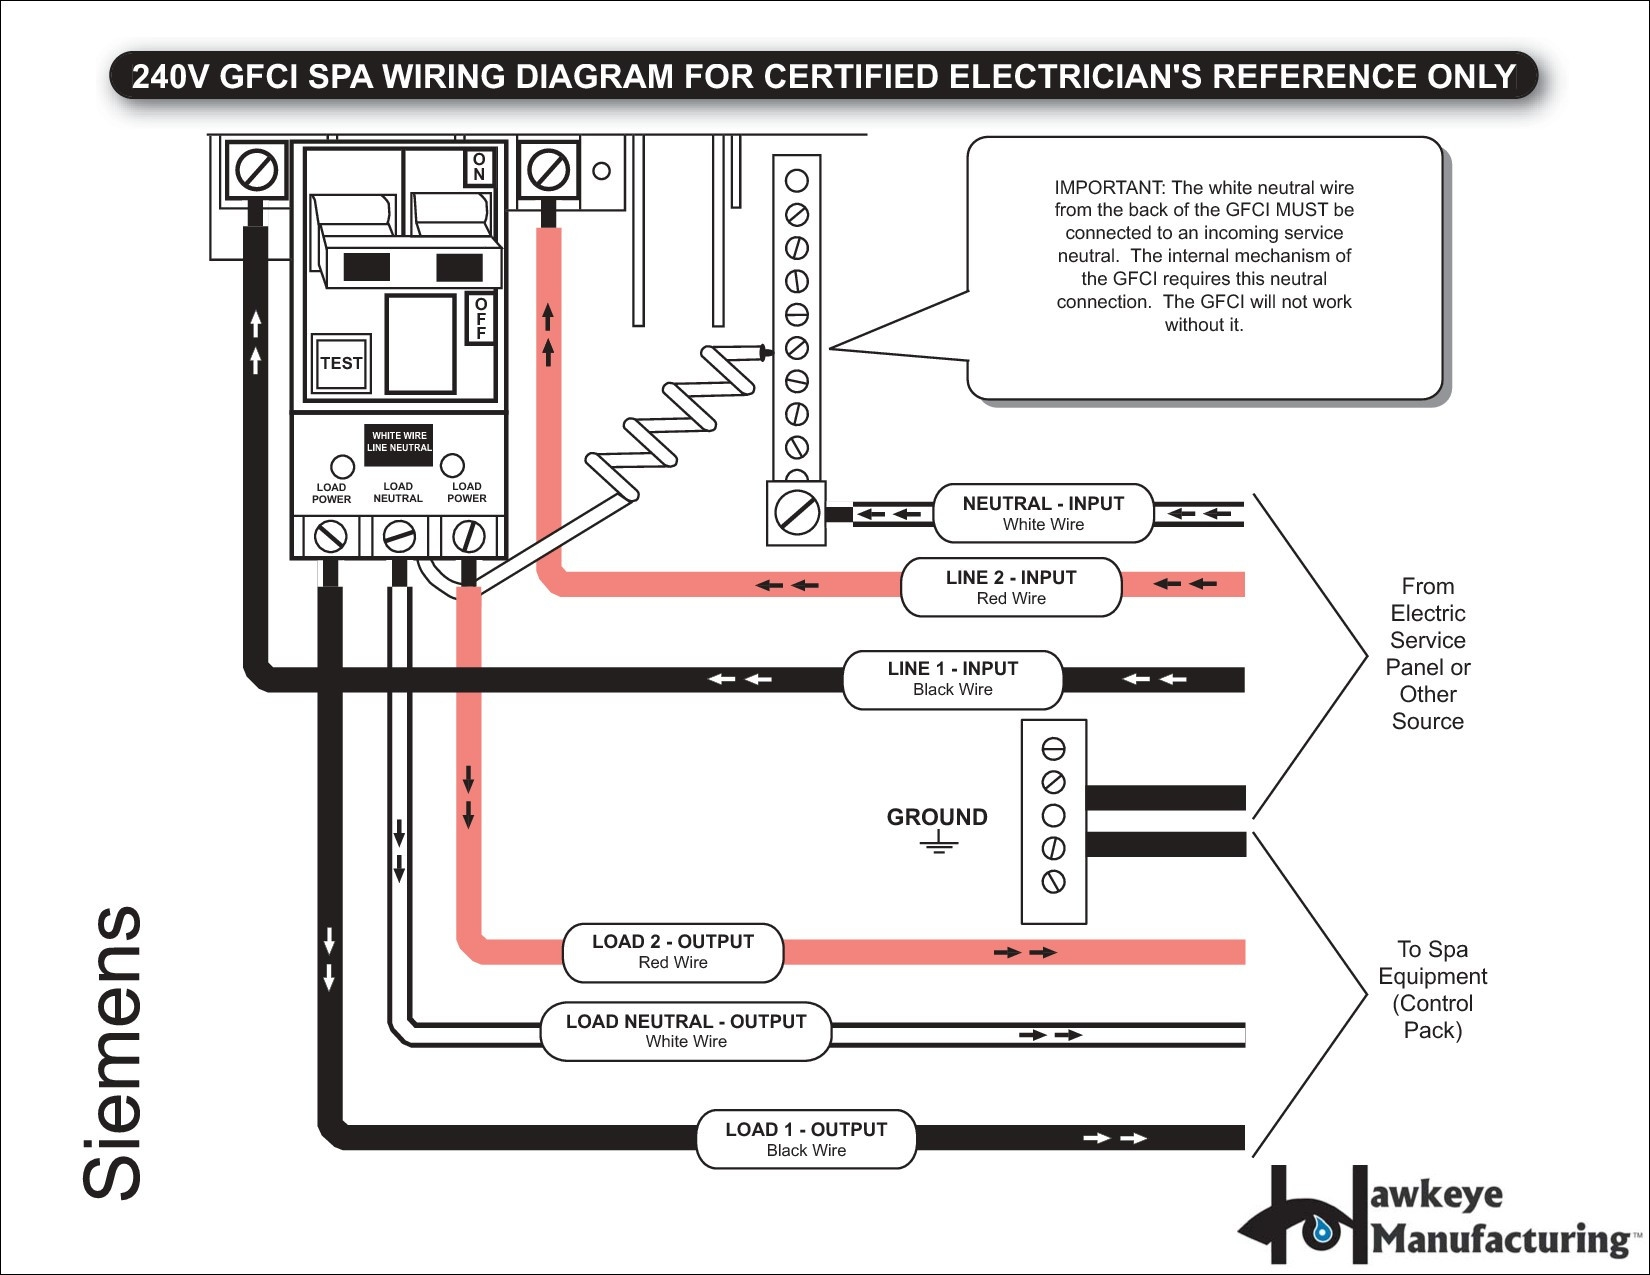 50 Amp Square D Gfci Breaker Wiring Diagram